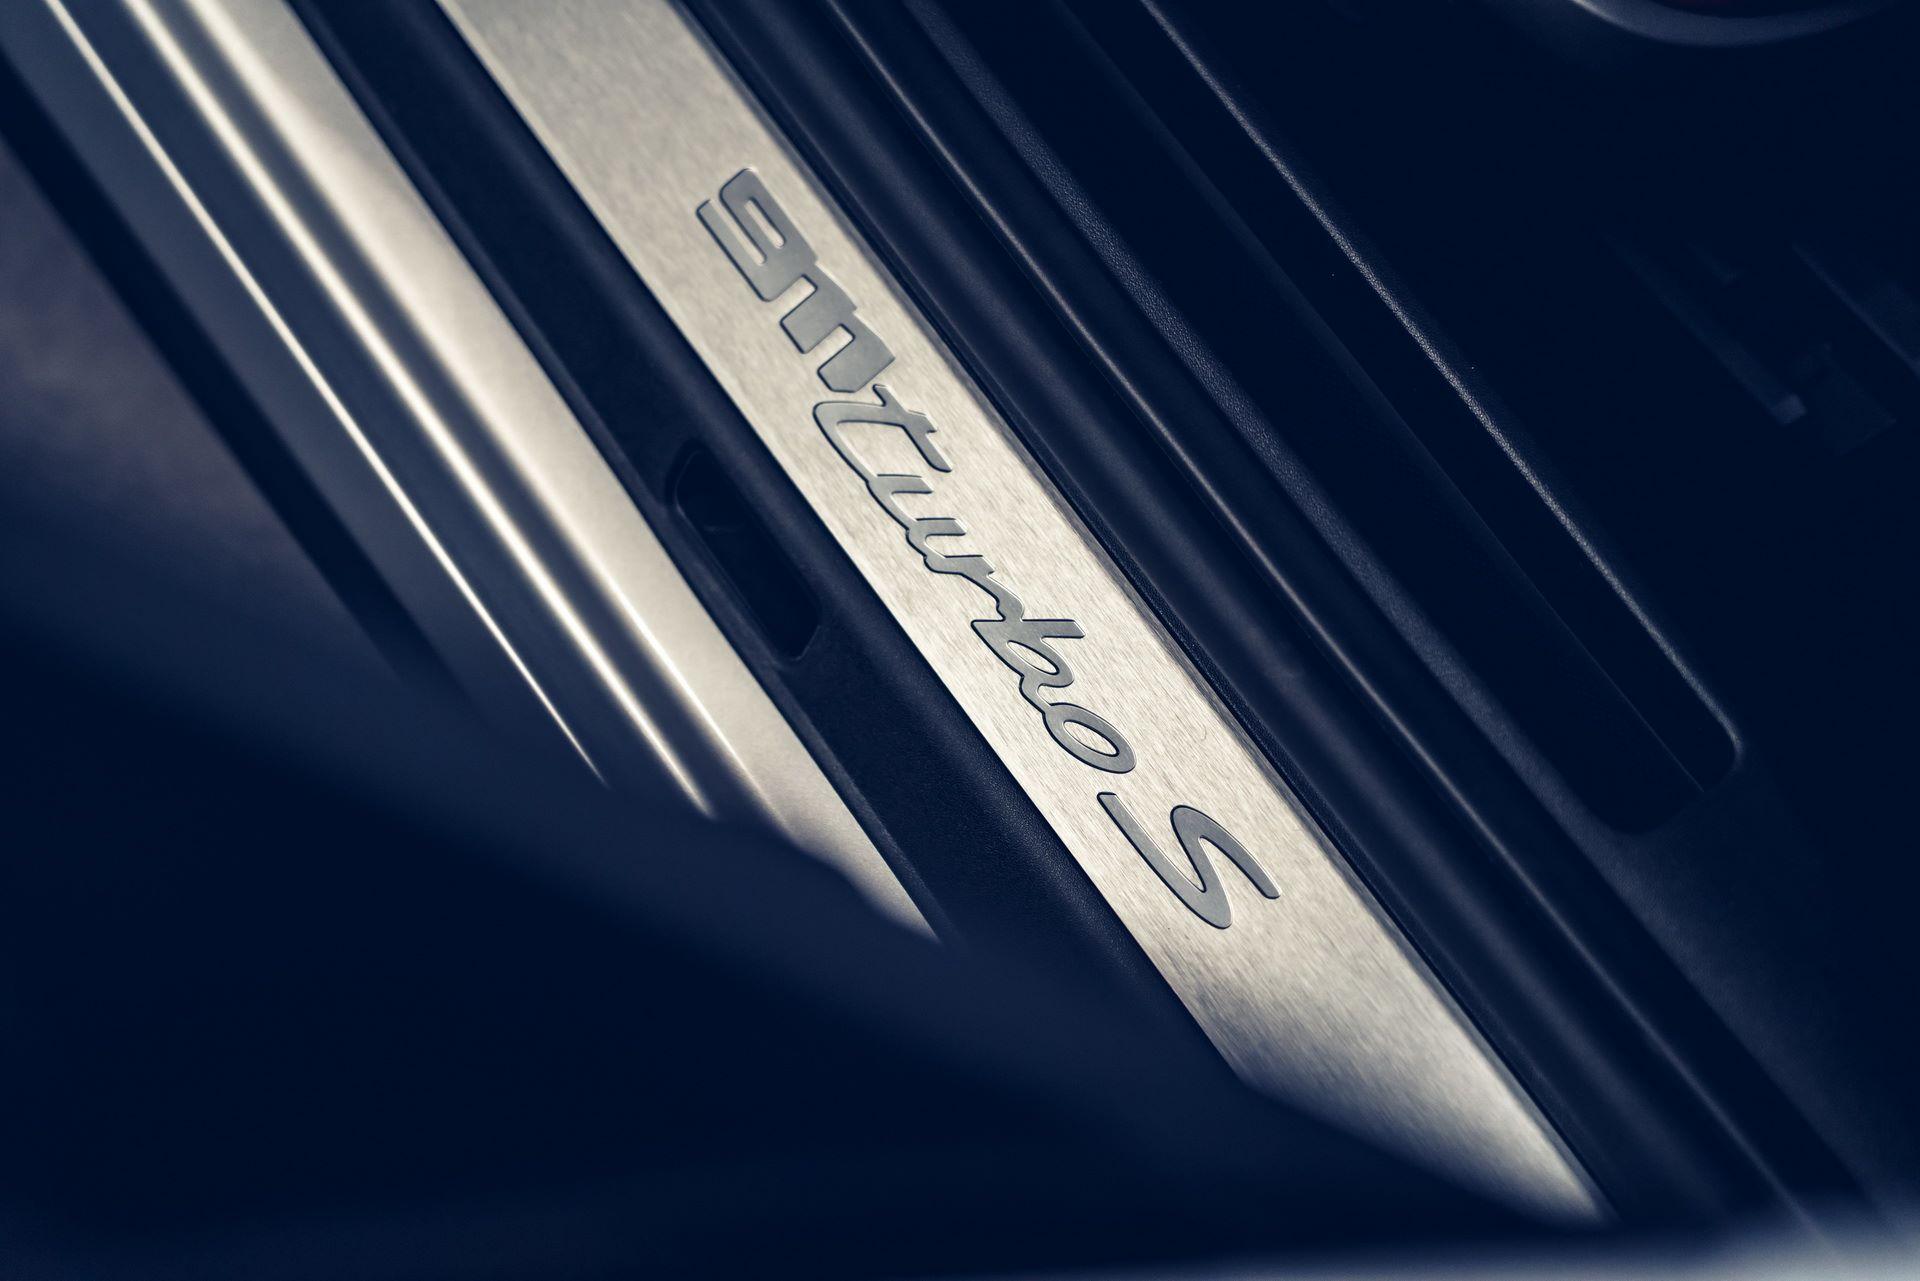 Porsche-911-Turbo-S-2020-24